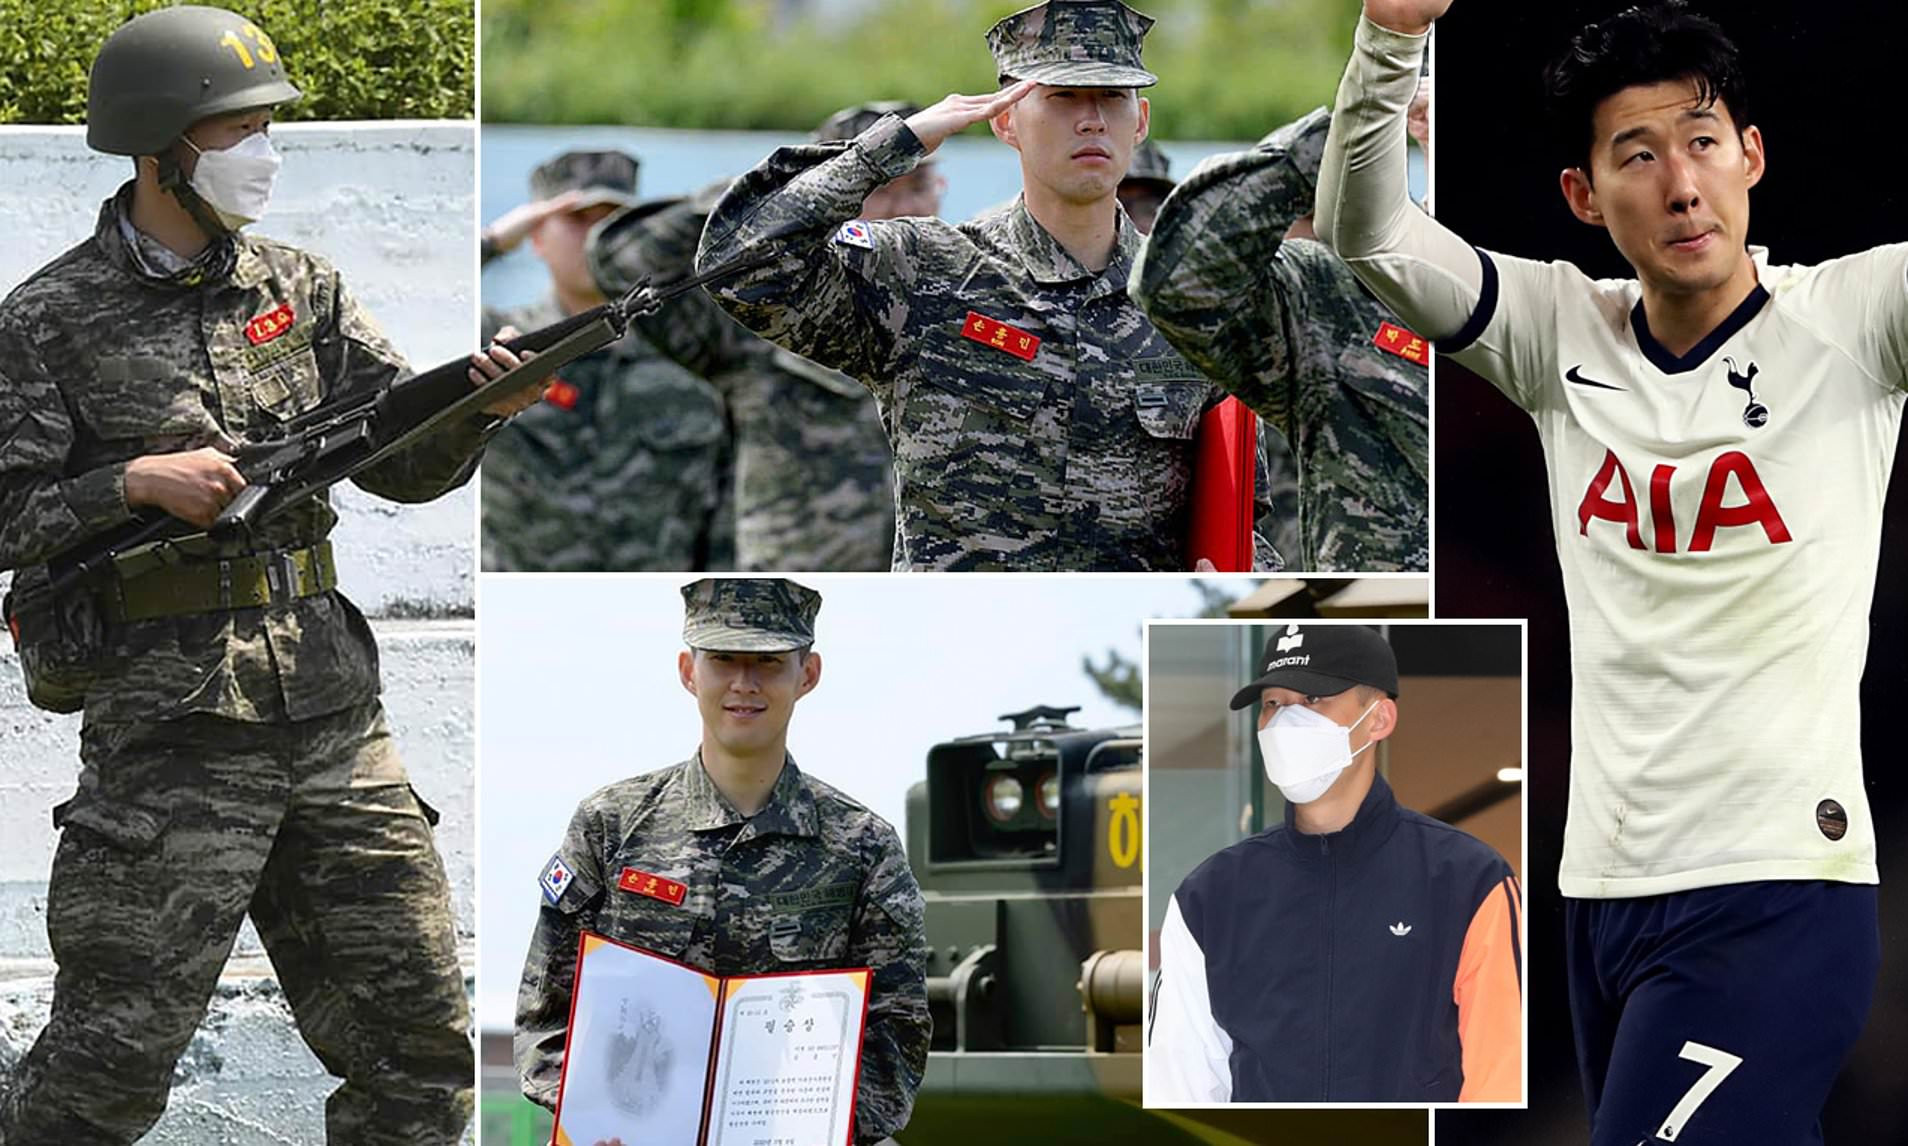 Tottenham Forward, Son finishes military training in South Korea